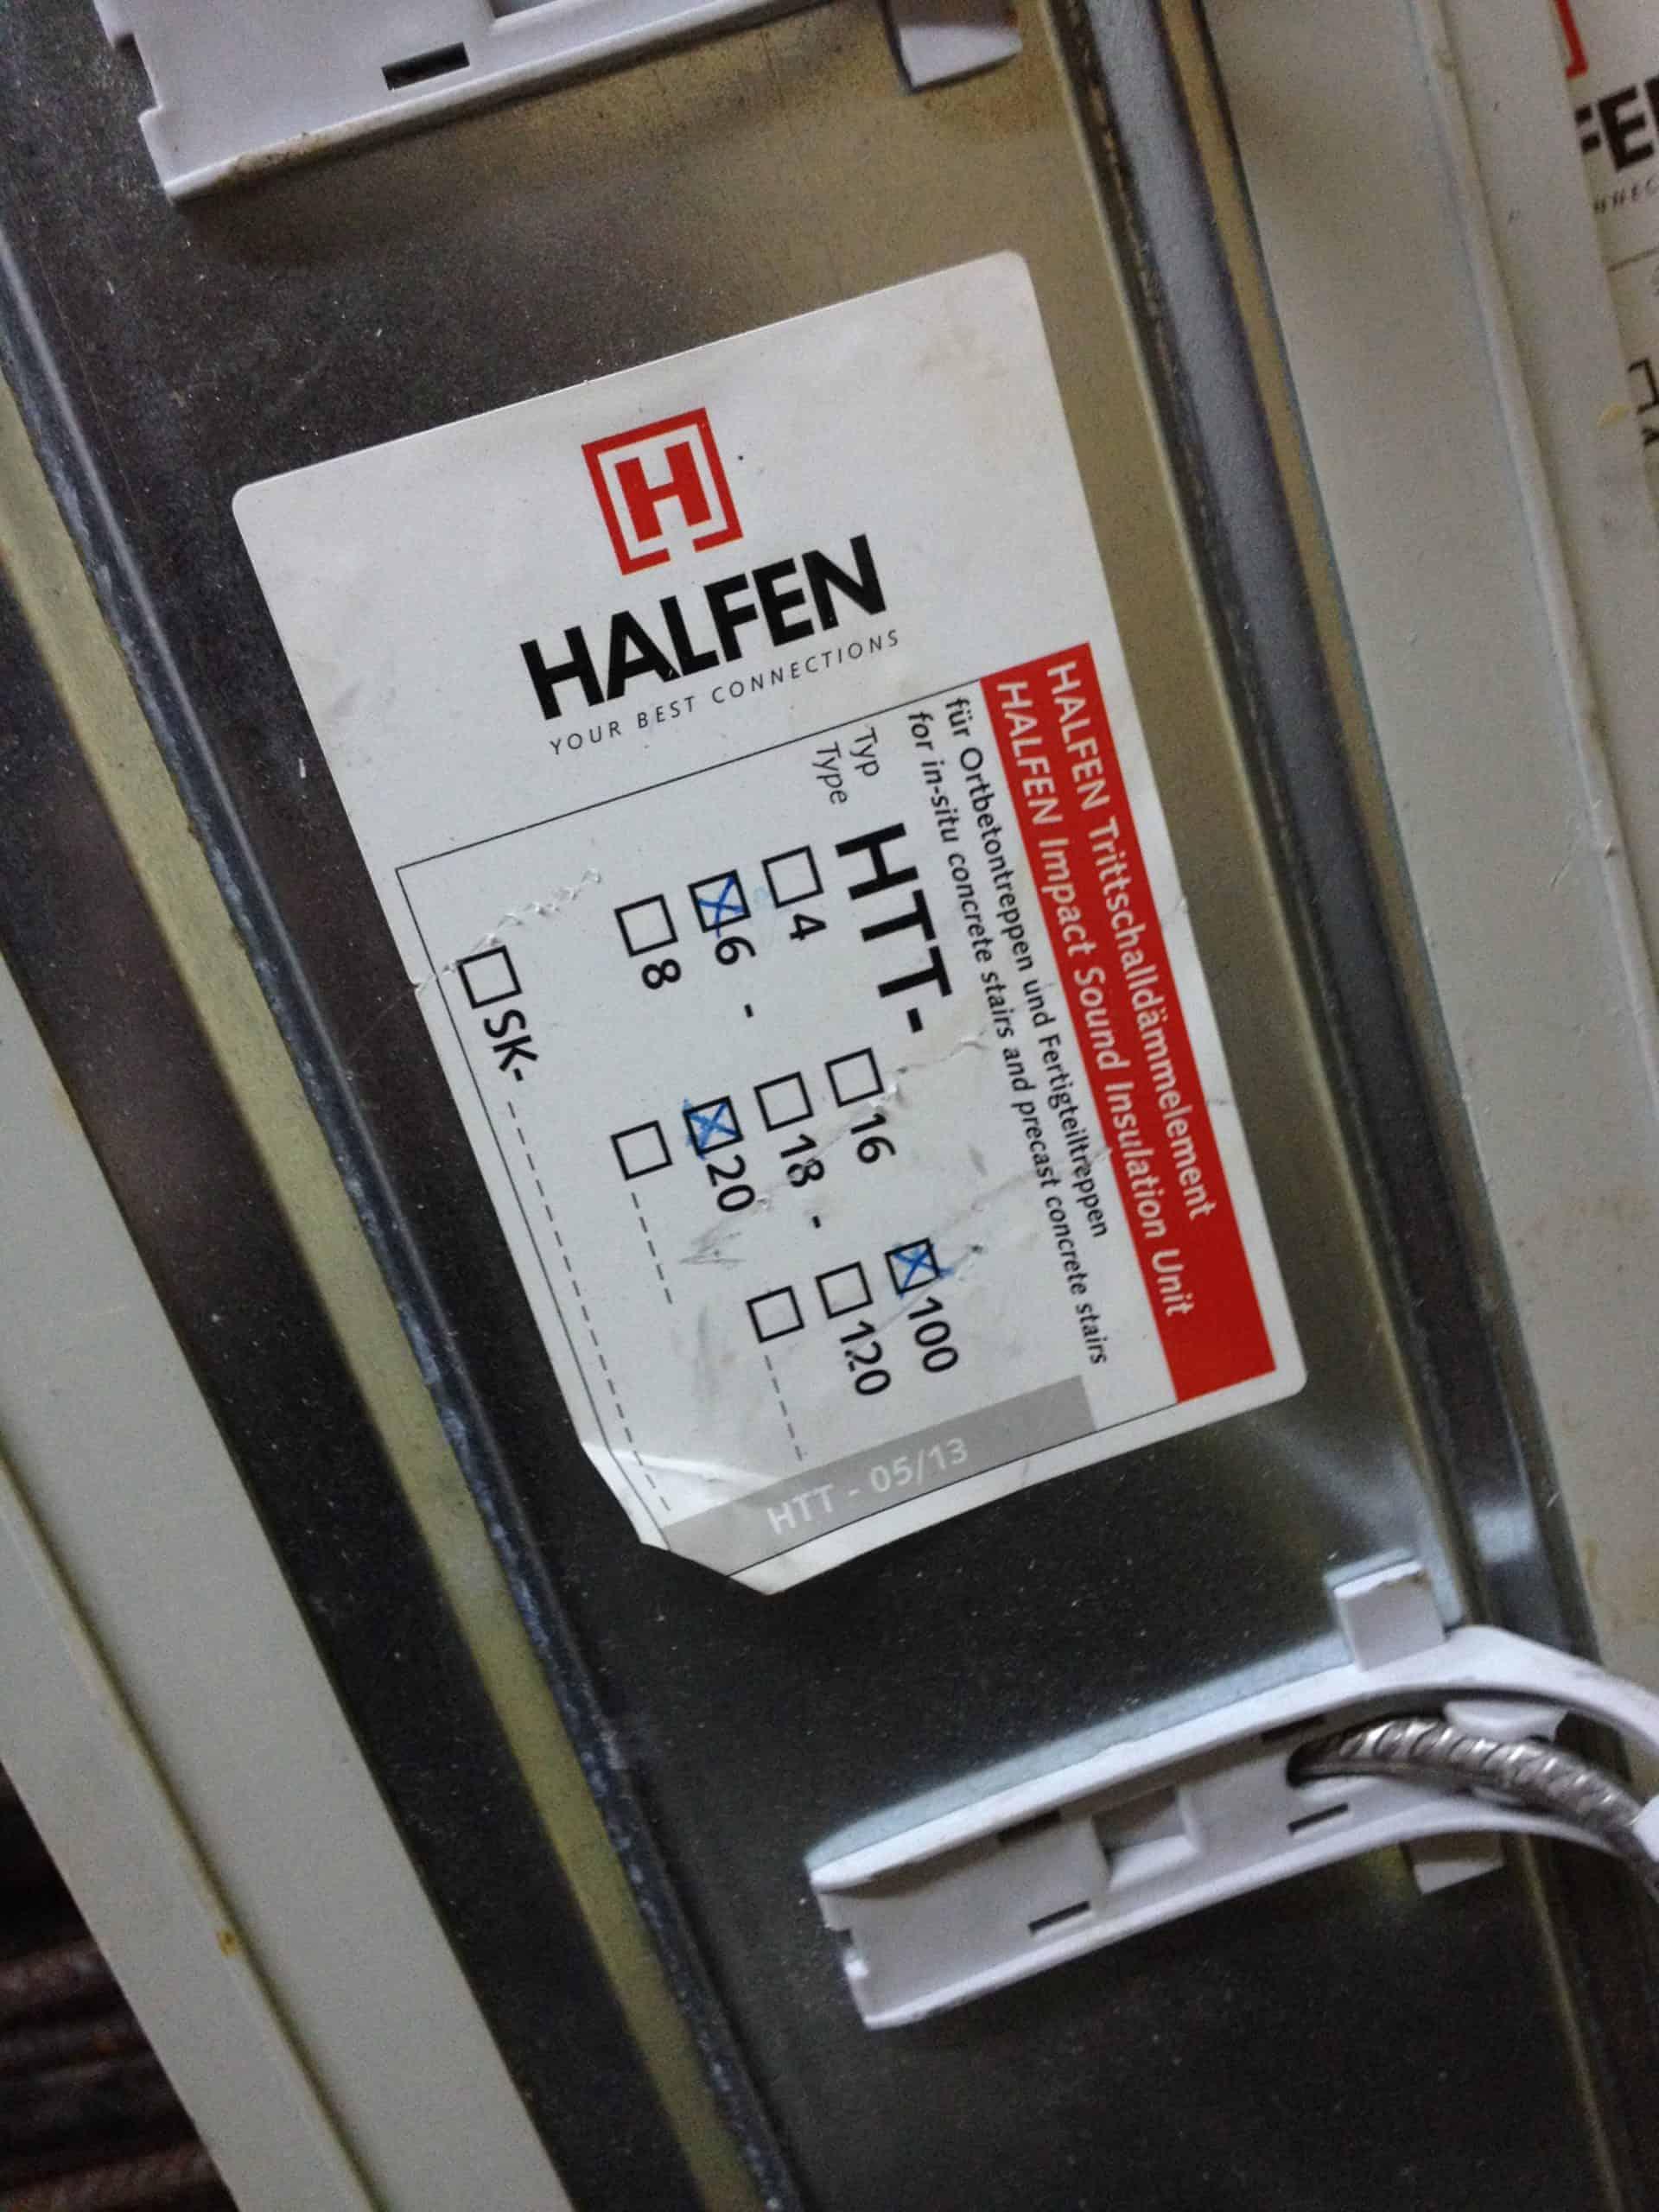 Halfen HIT-SP-MV- 1207 Balkonanschluss HTT Trittschalldämmelemente